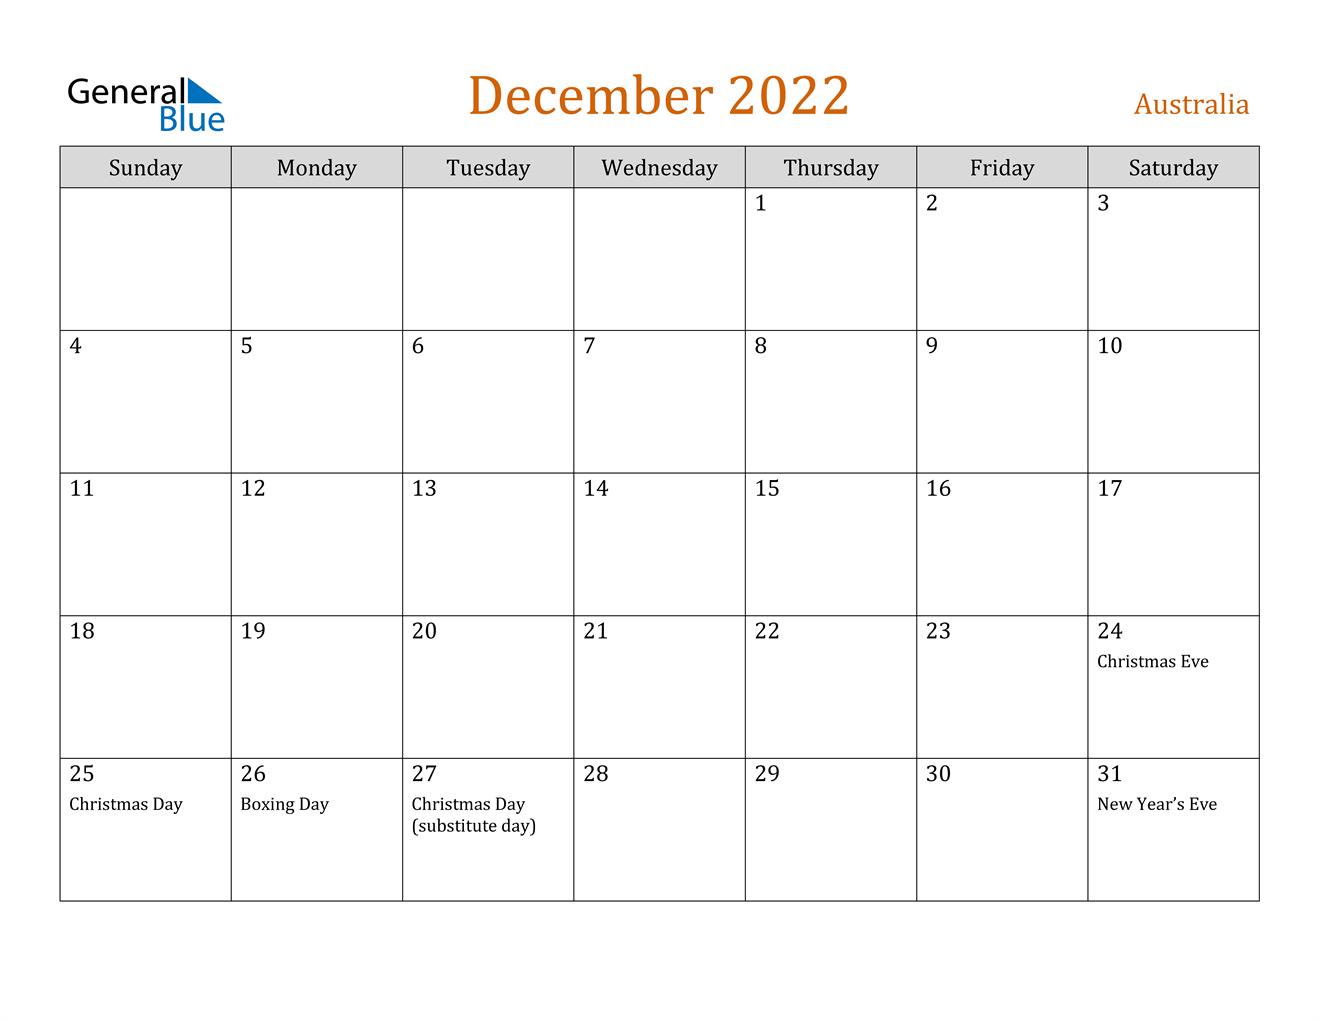 December 2022 Calendar - Australia